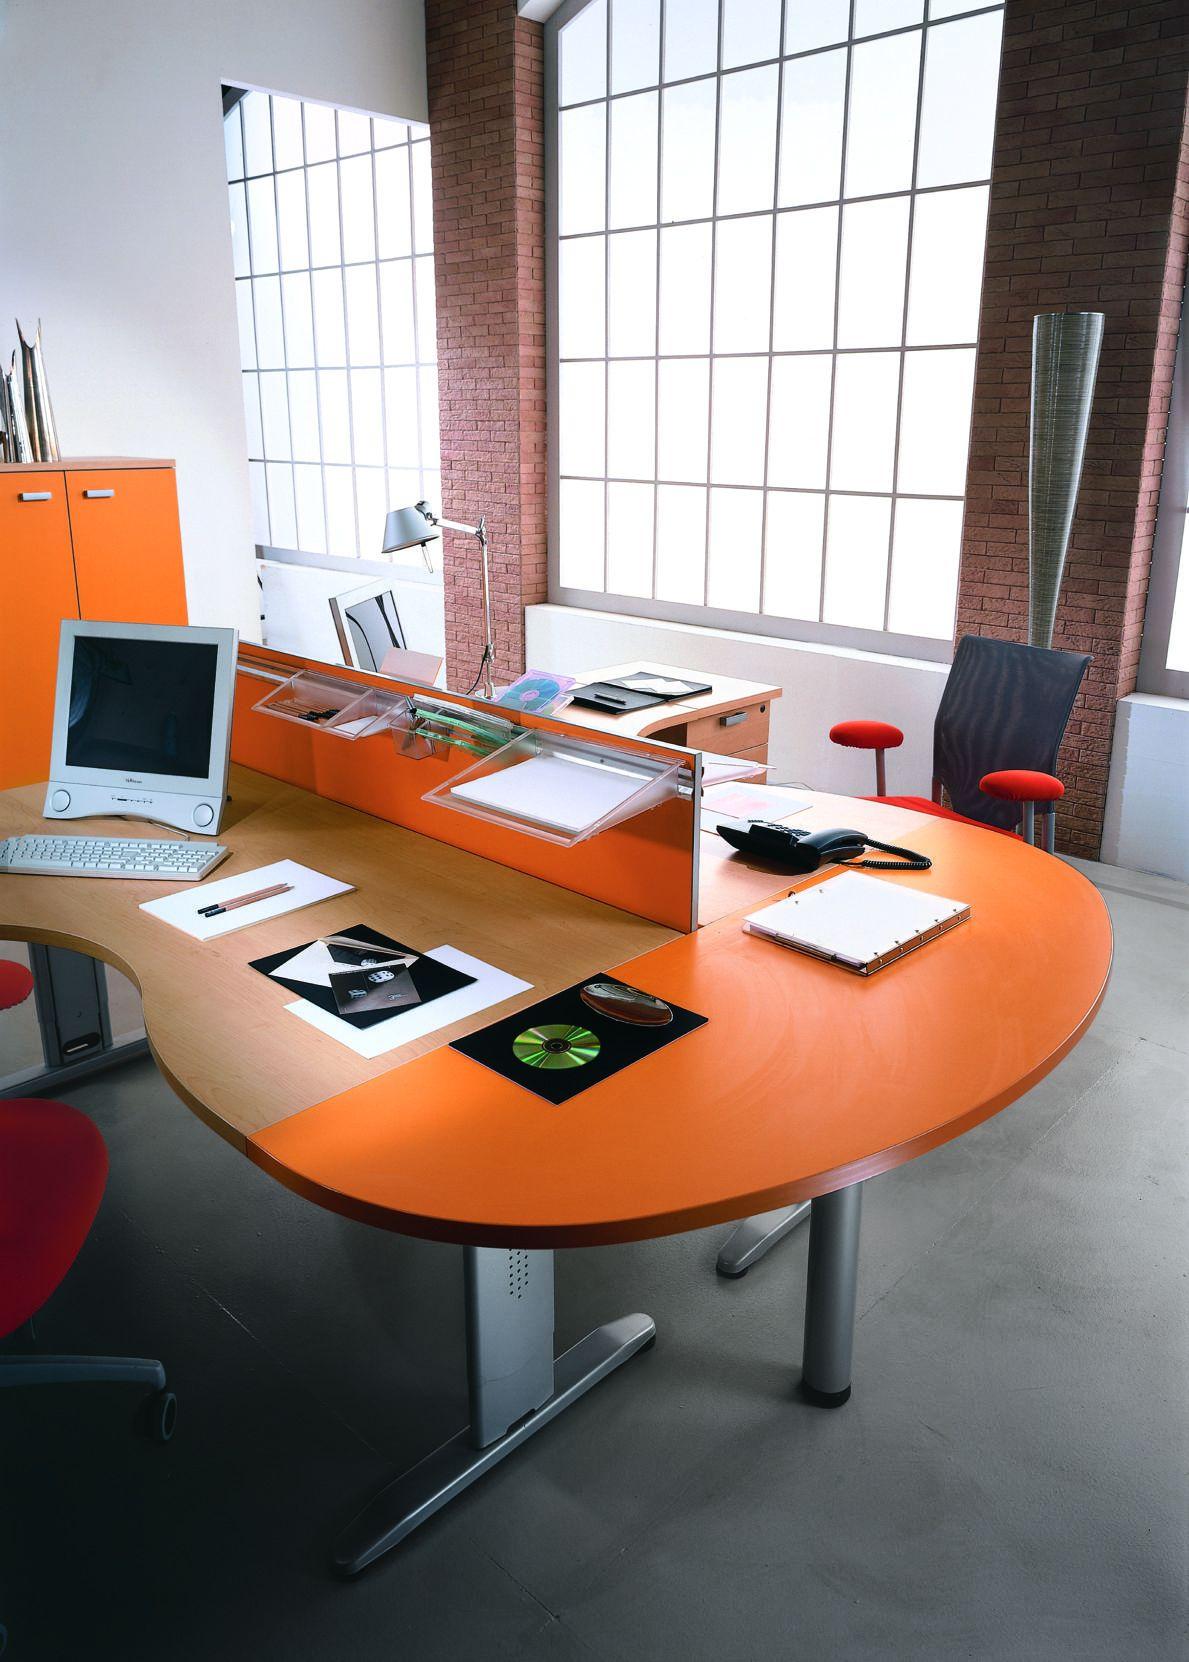 Workstation office furniture - Office Desk EIDOS 44 ...   eidos furniture